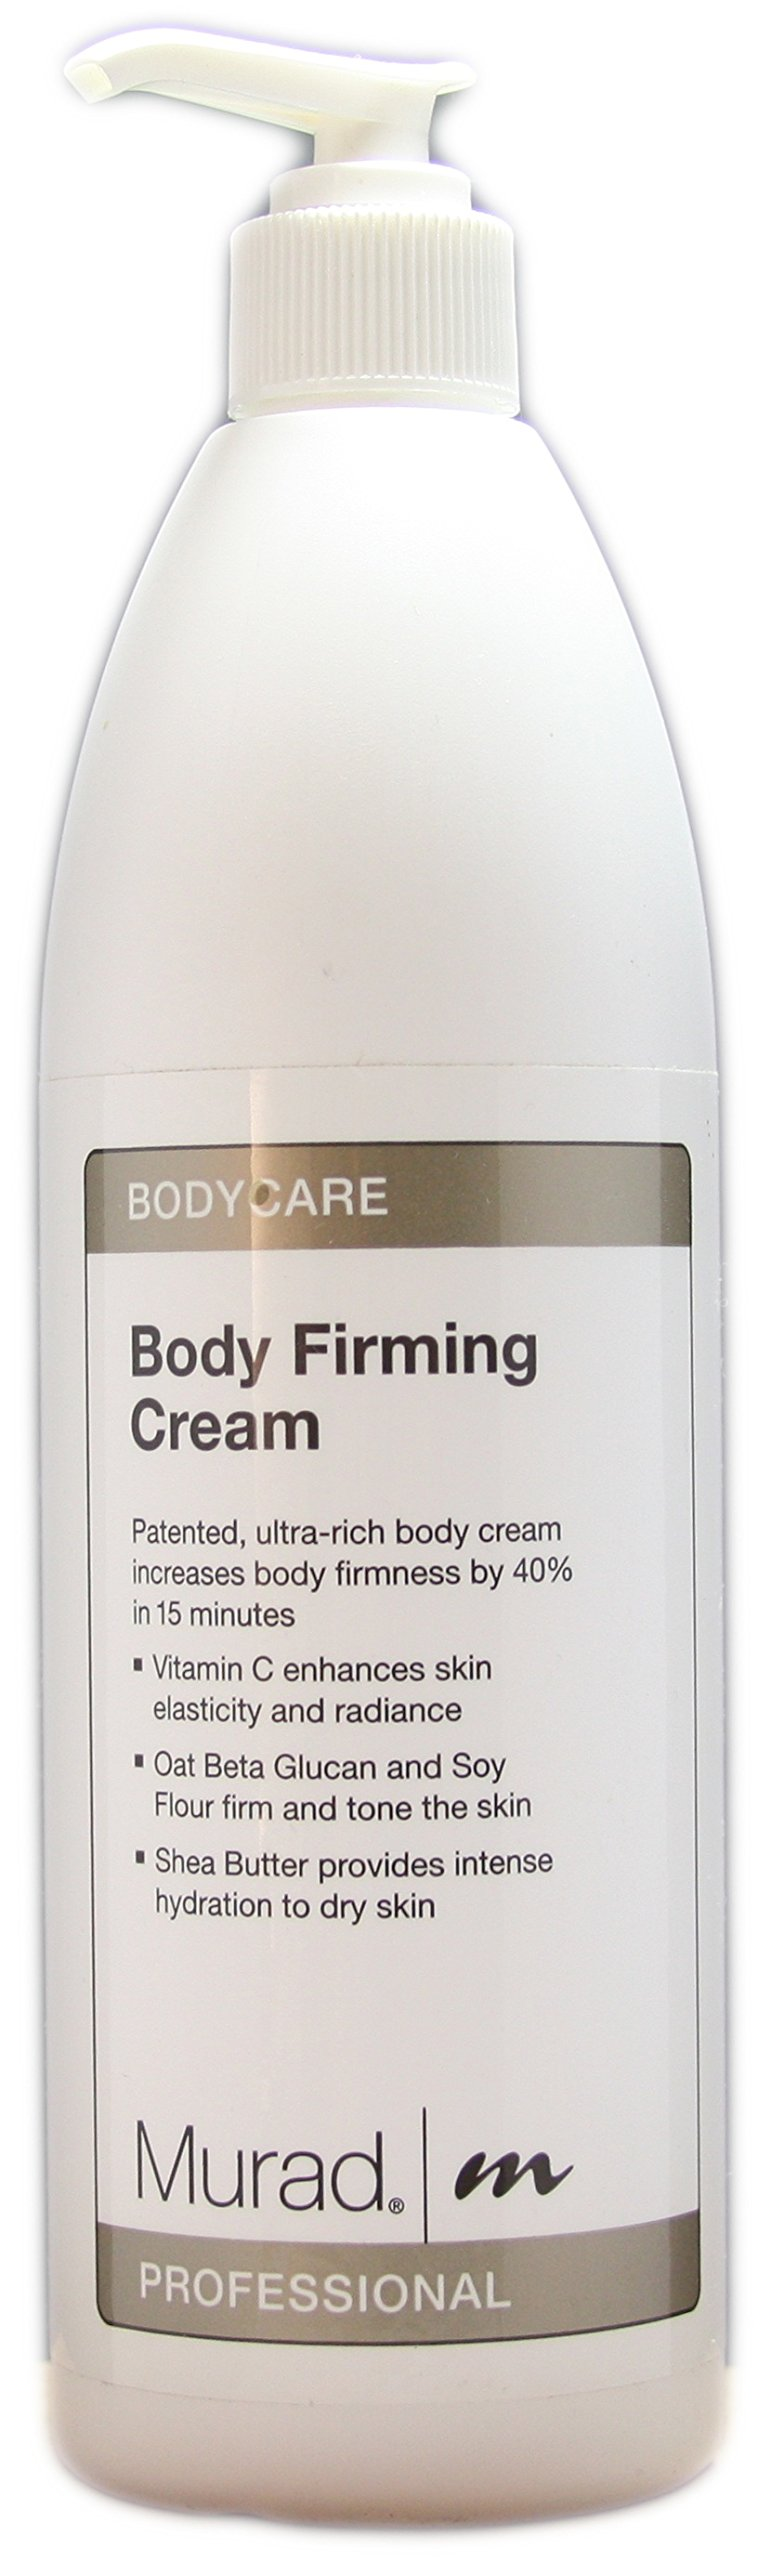 Body Firming Cream ( Salon Size ) - Murad - Advanced Performance - Body Care - 500ml/16.9oz